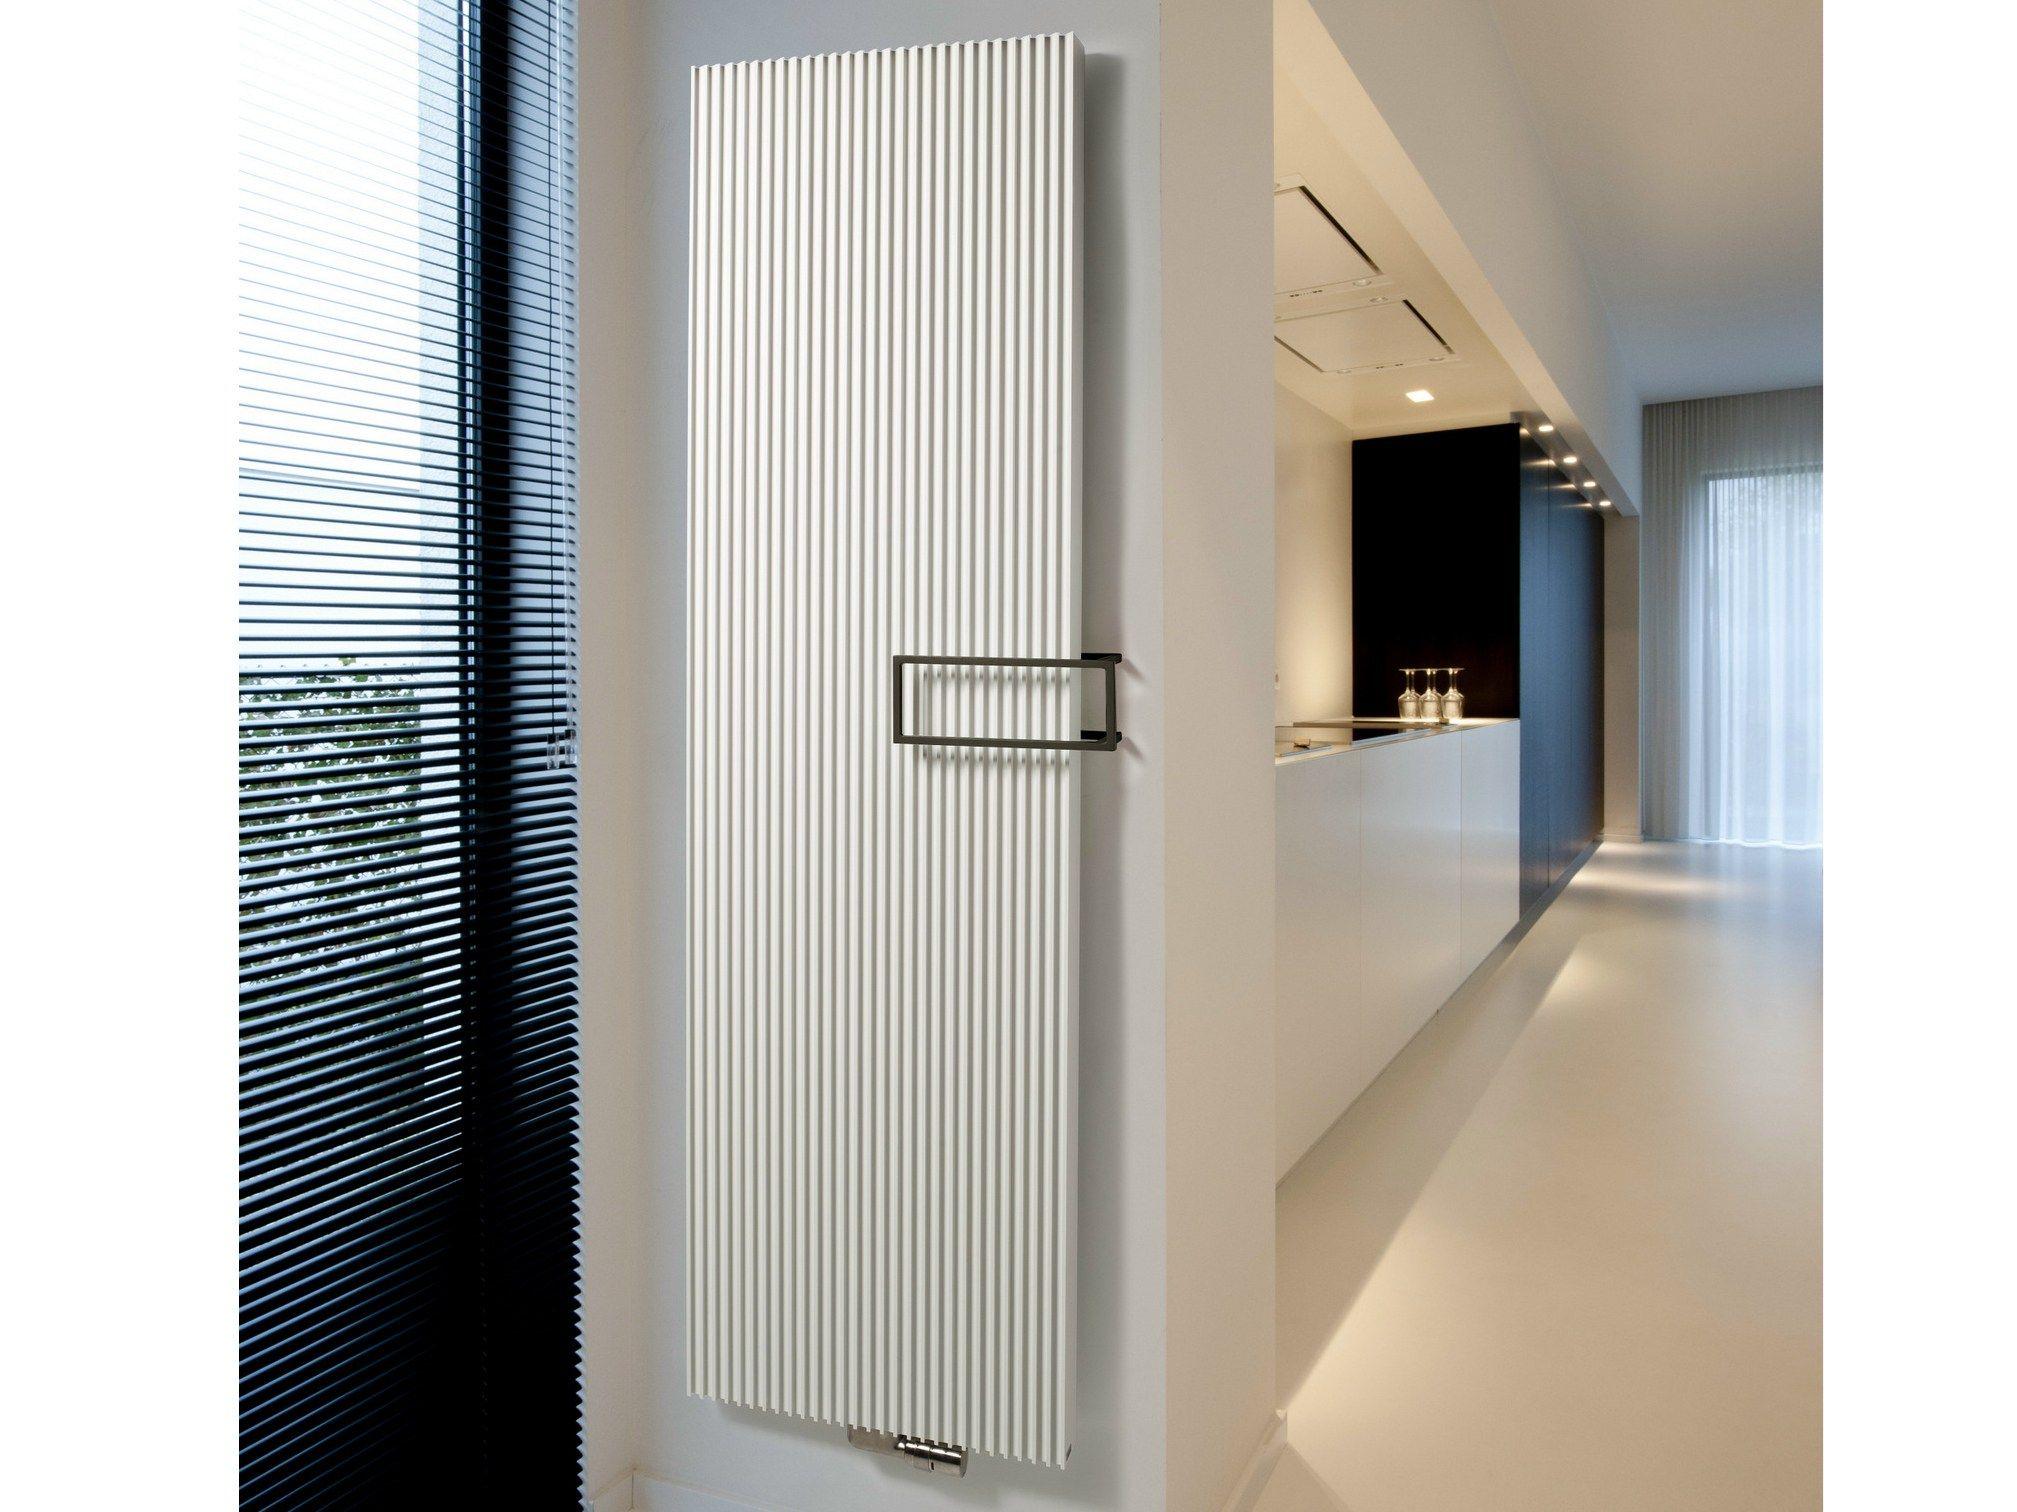 radiateur d coratif vertical en aluminium canyon by vasco. Black Bedroom Furniture Sets. Home Design Ideas